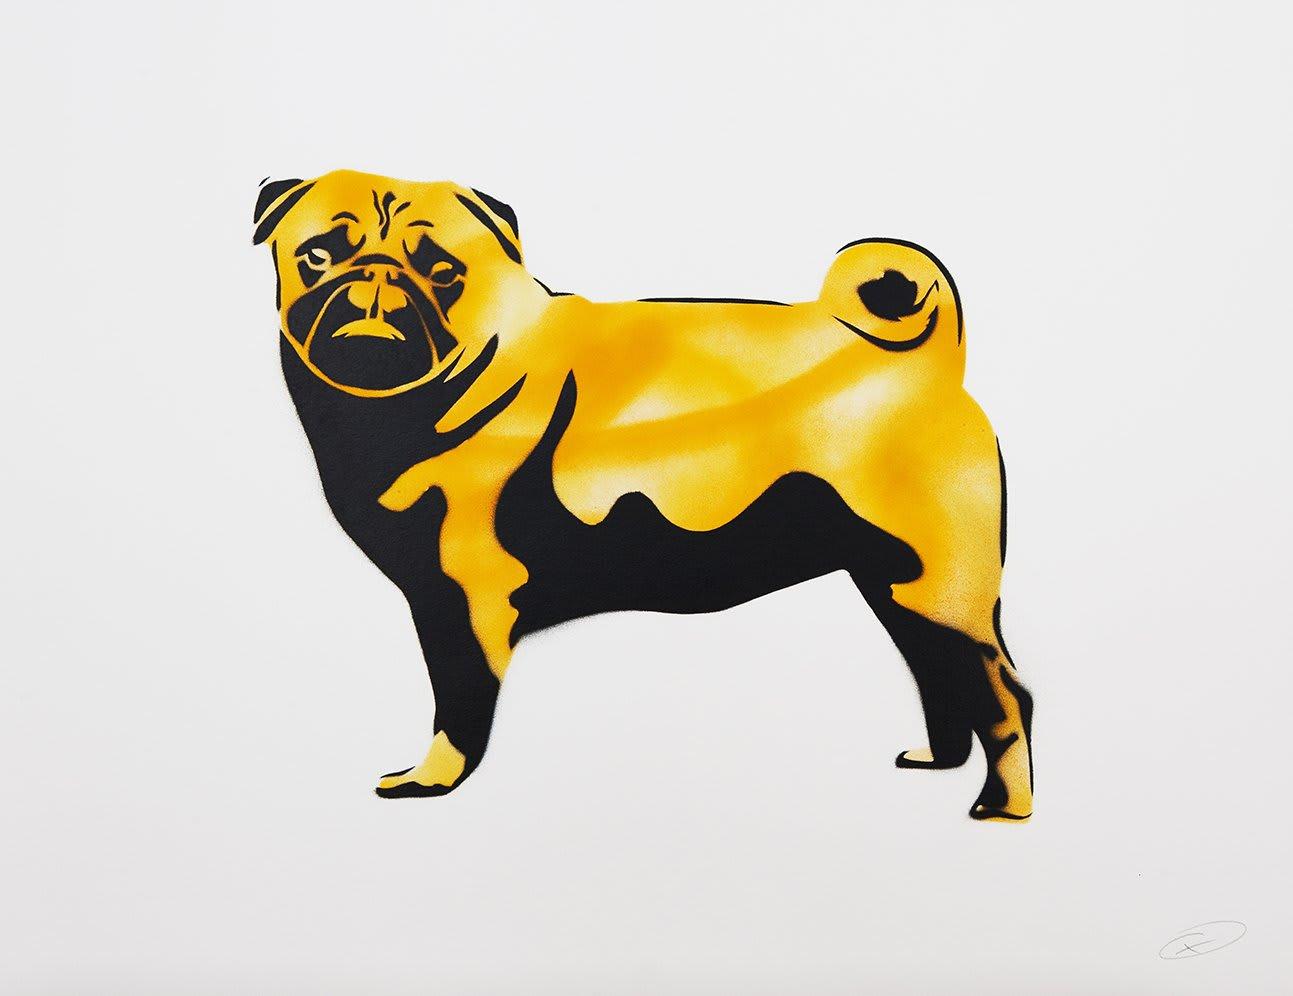 XOOOOX, Pug 1 (CMYK), 2013